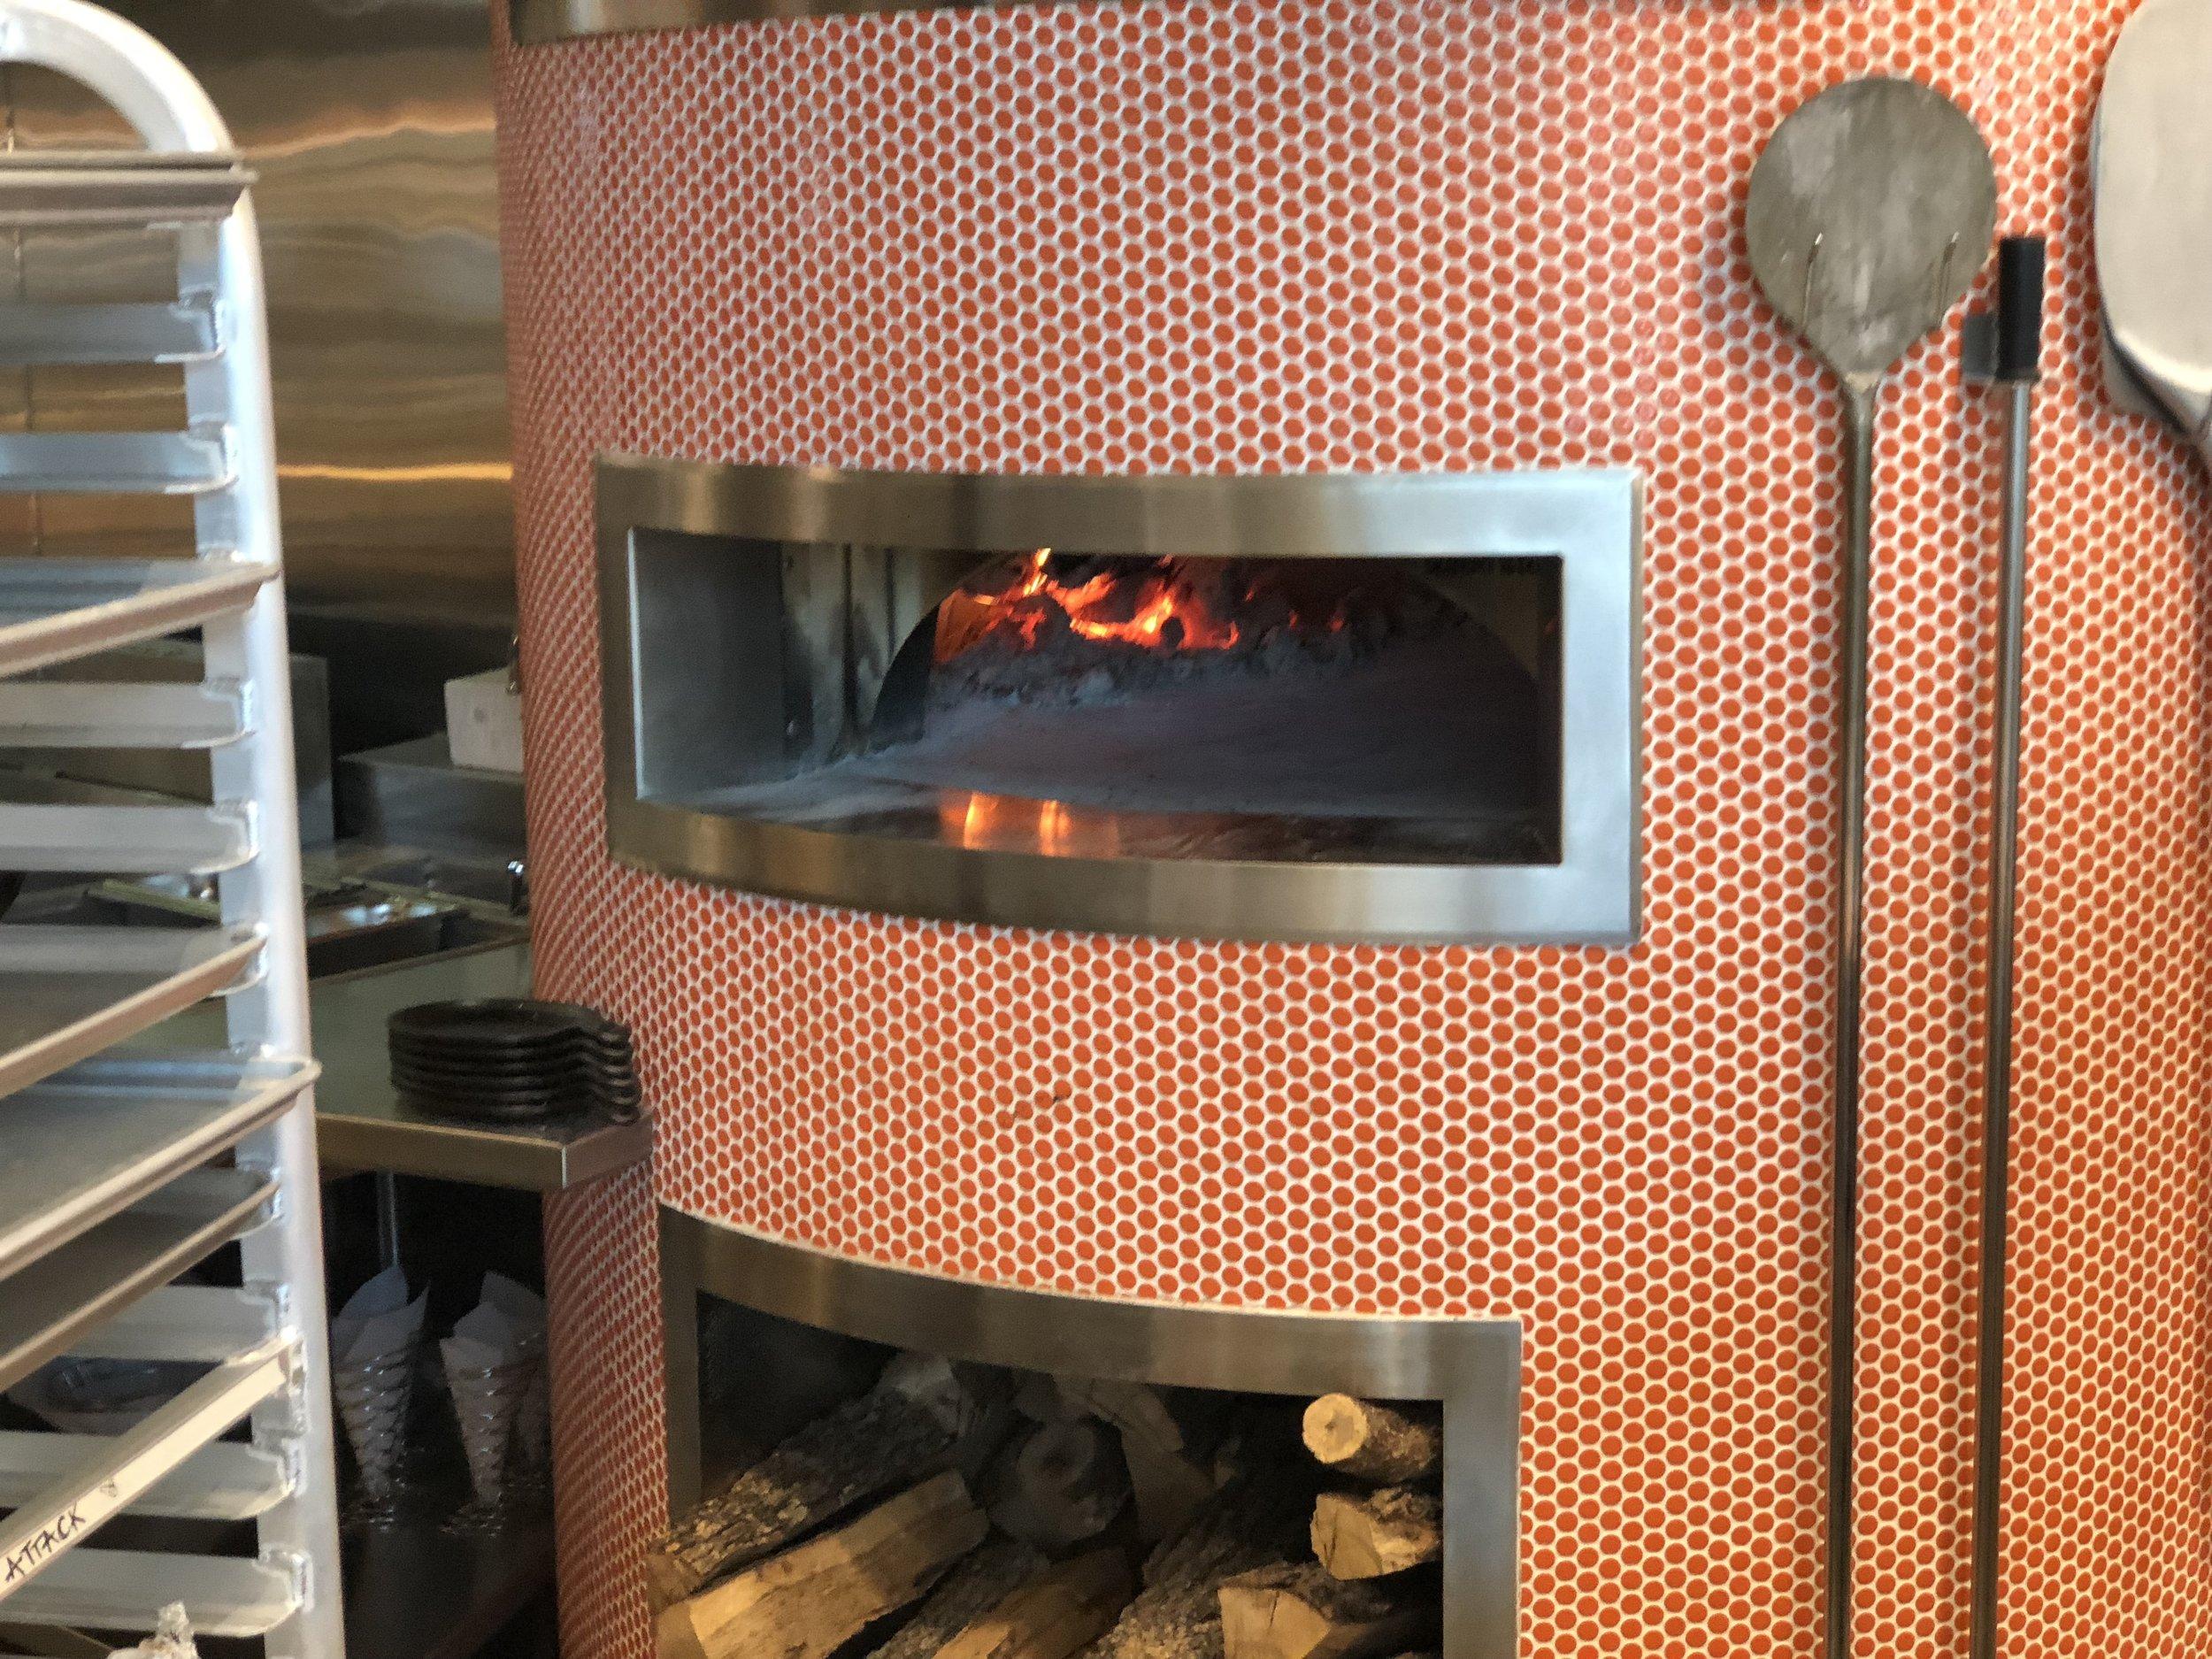 Wood-burning pizza oven